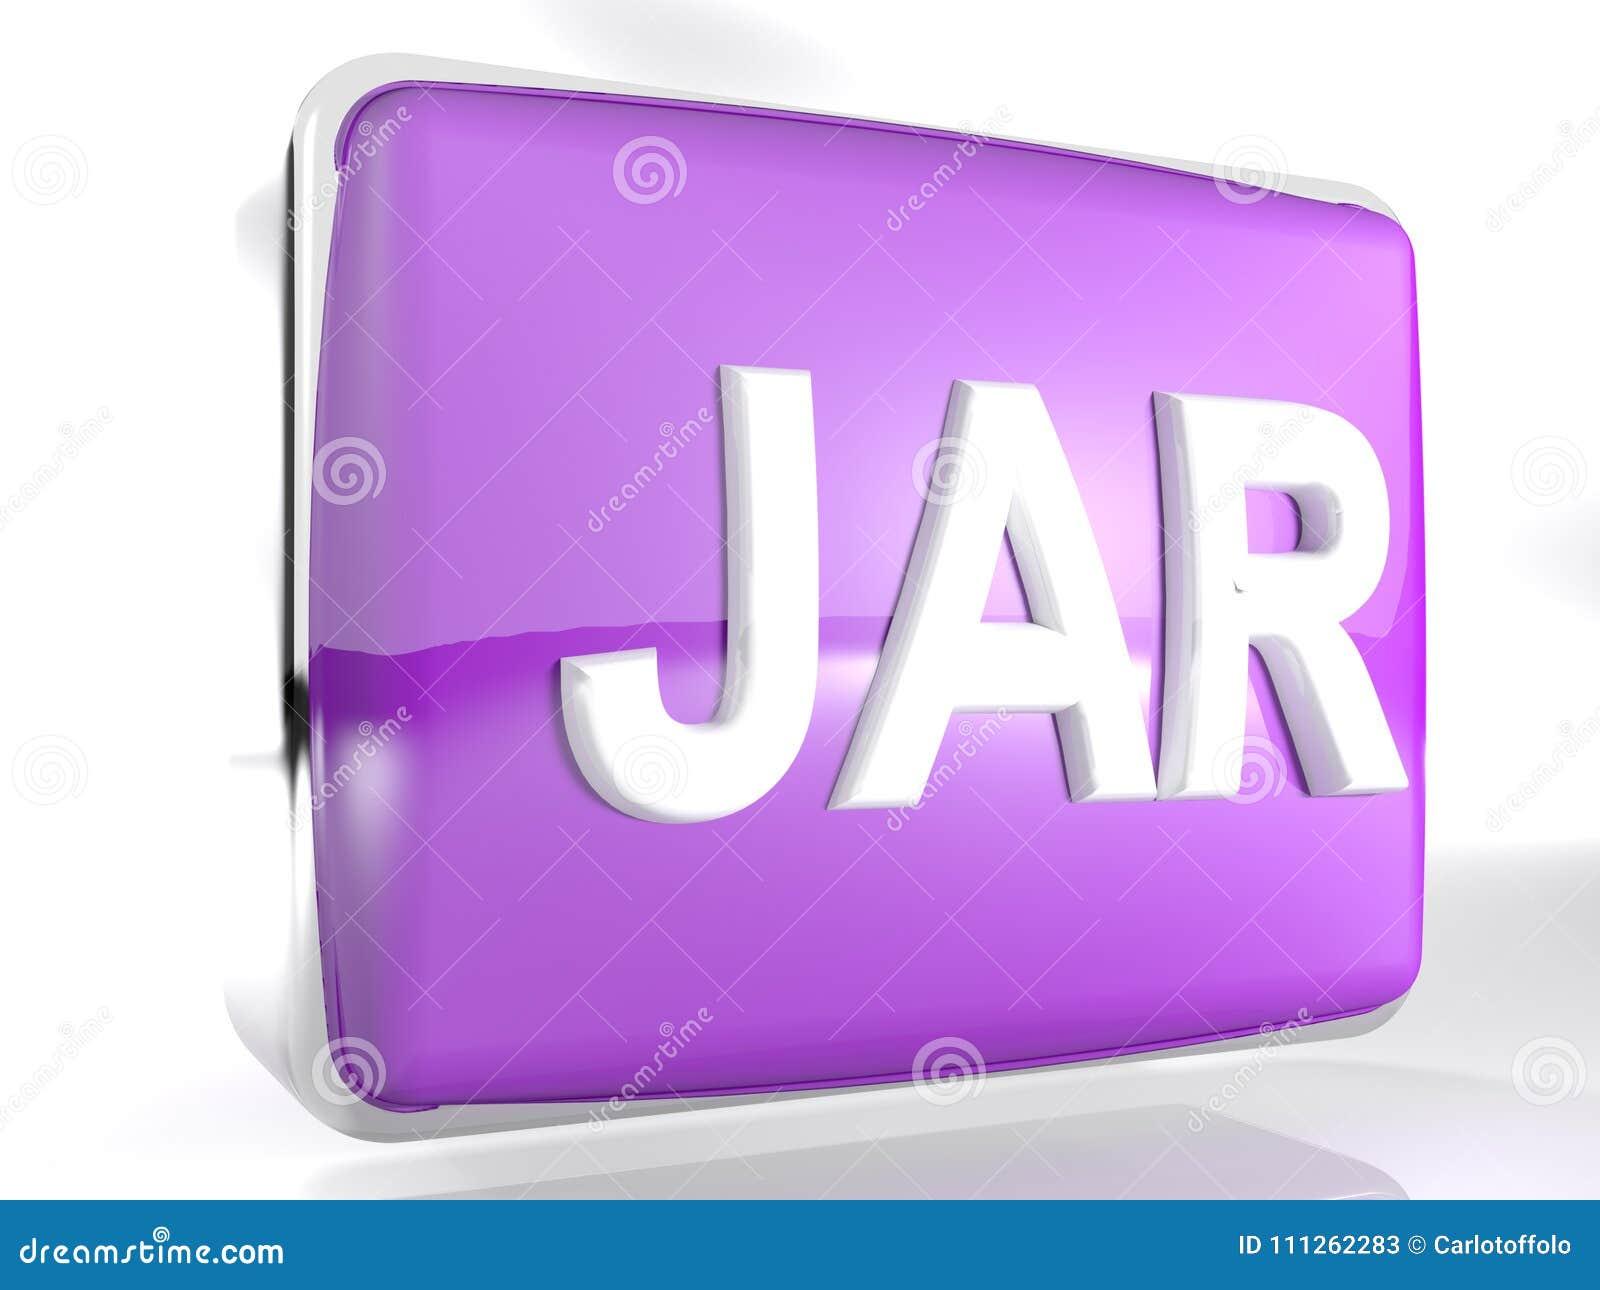 JAR Purple Box Icon - 3D Rendering Stock Illustration